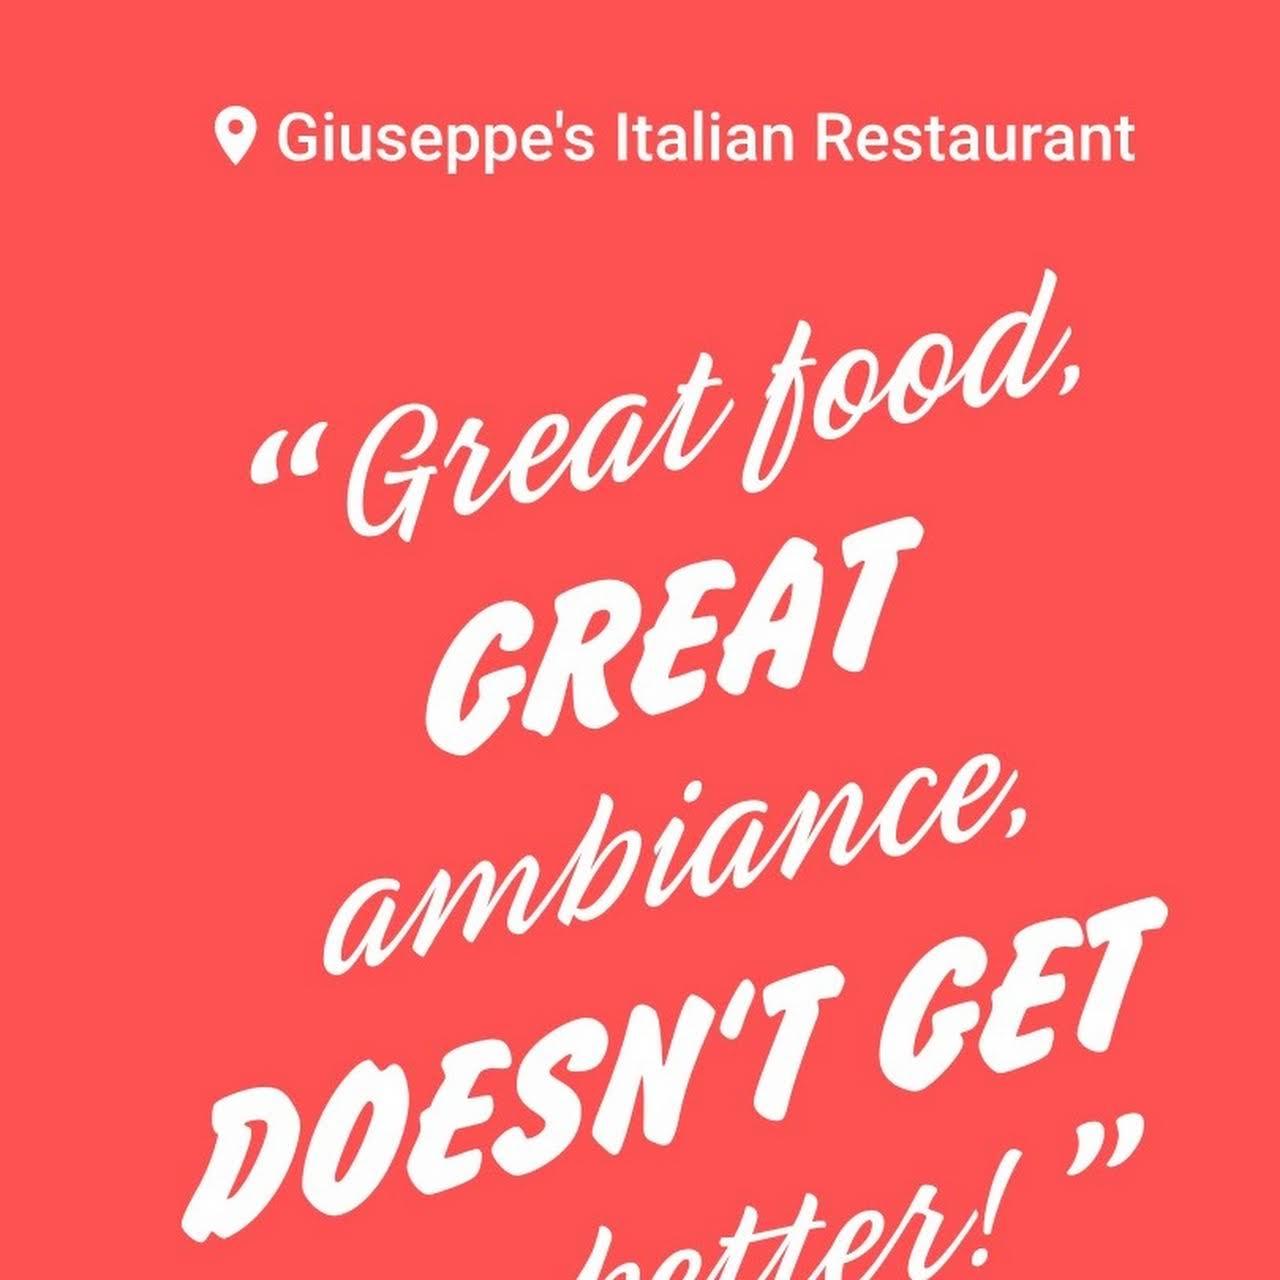 Fina S Giuseppes Italiano Restaurant In Hesperia Buffet Style